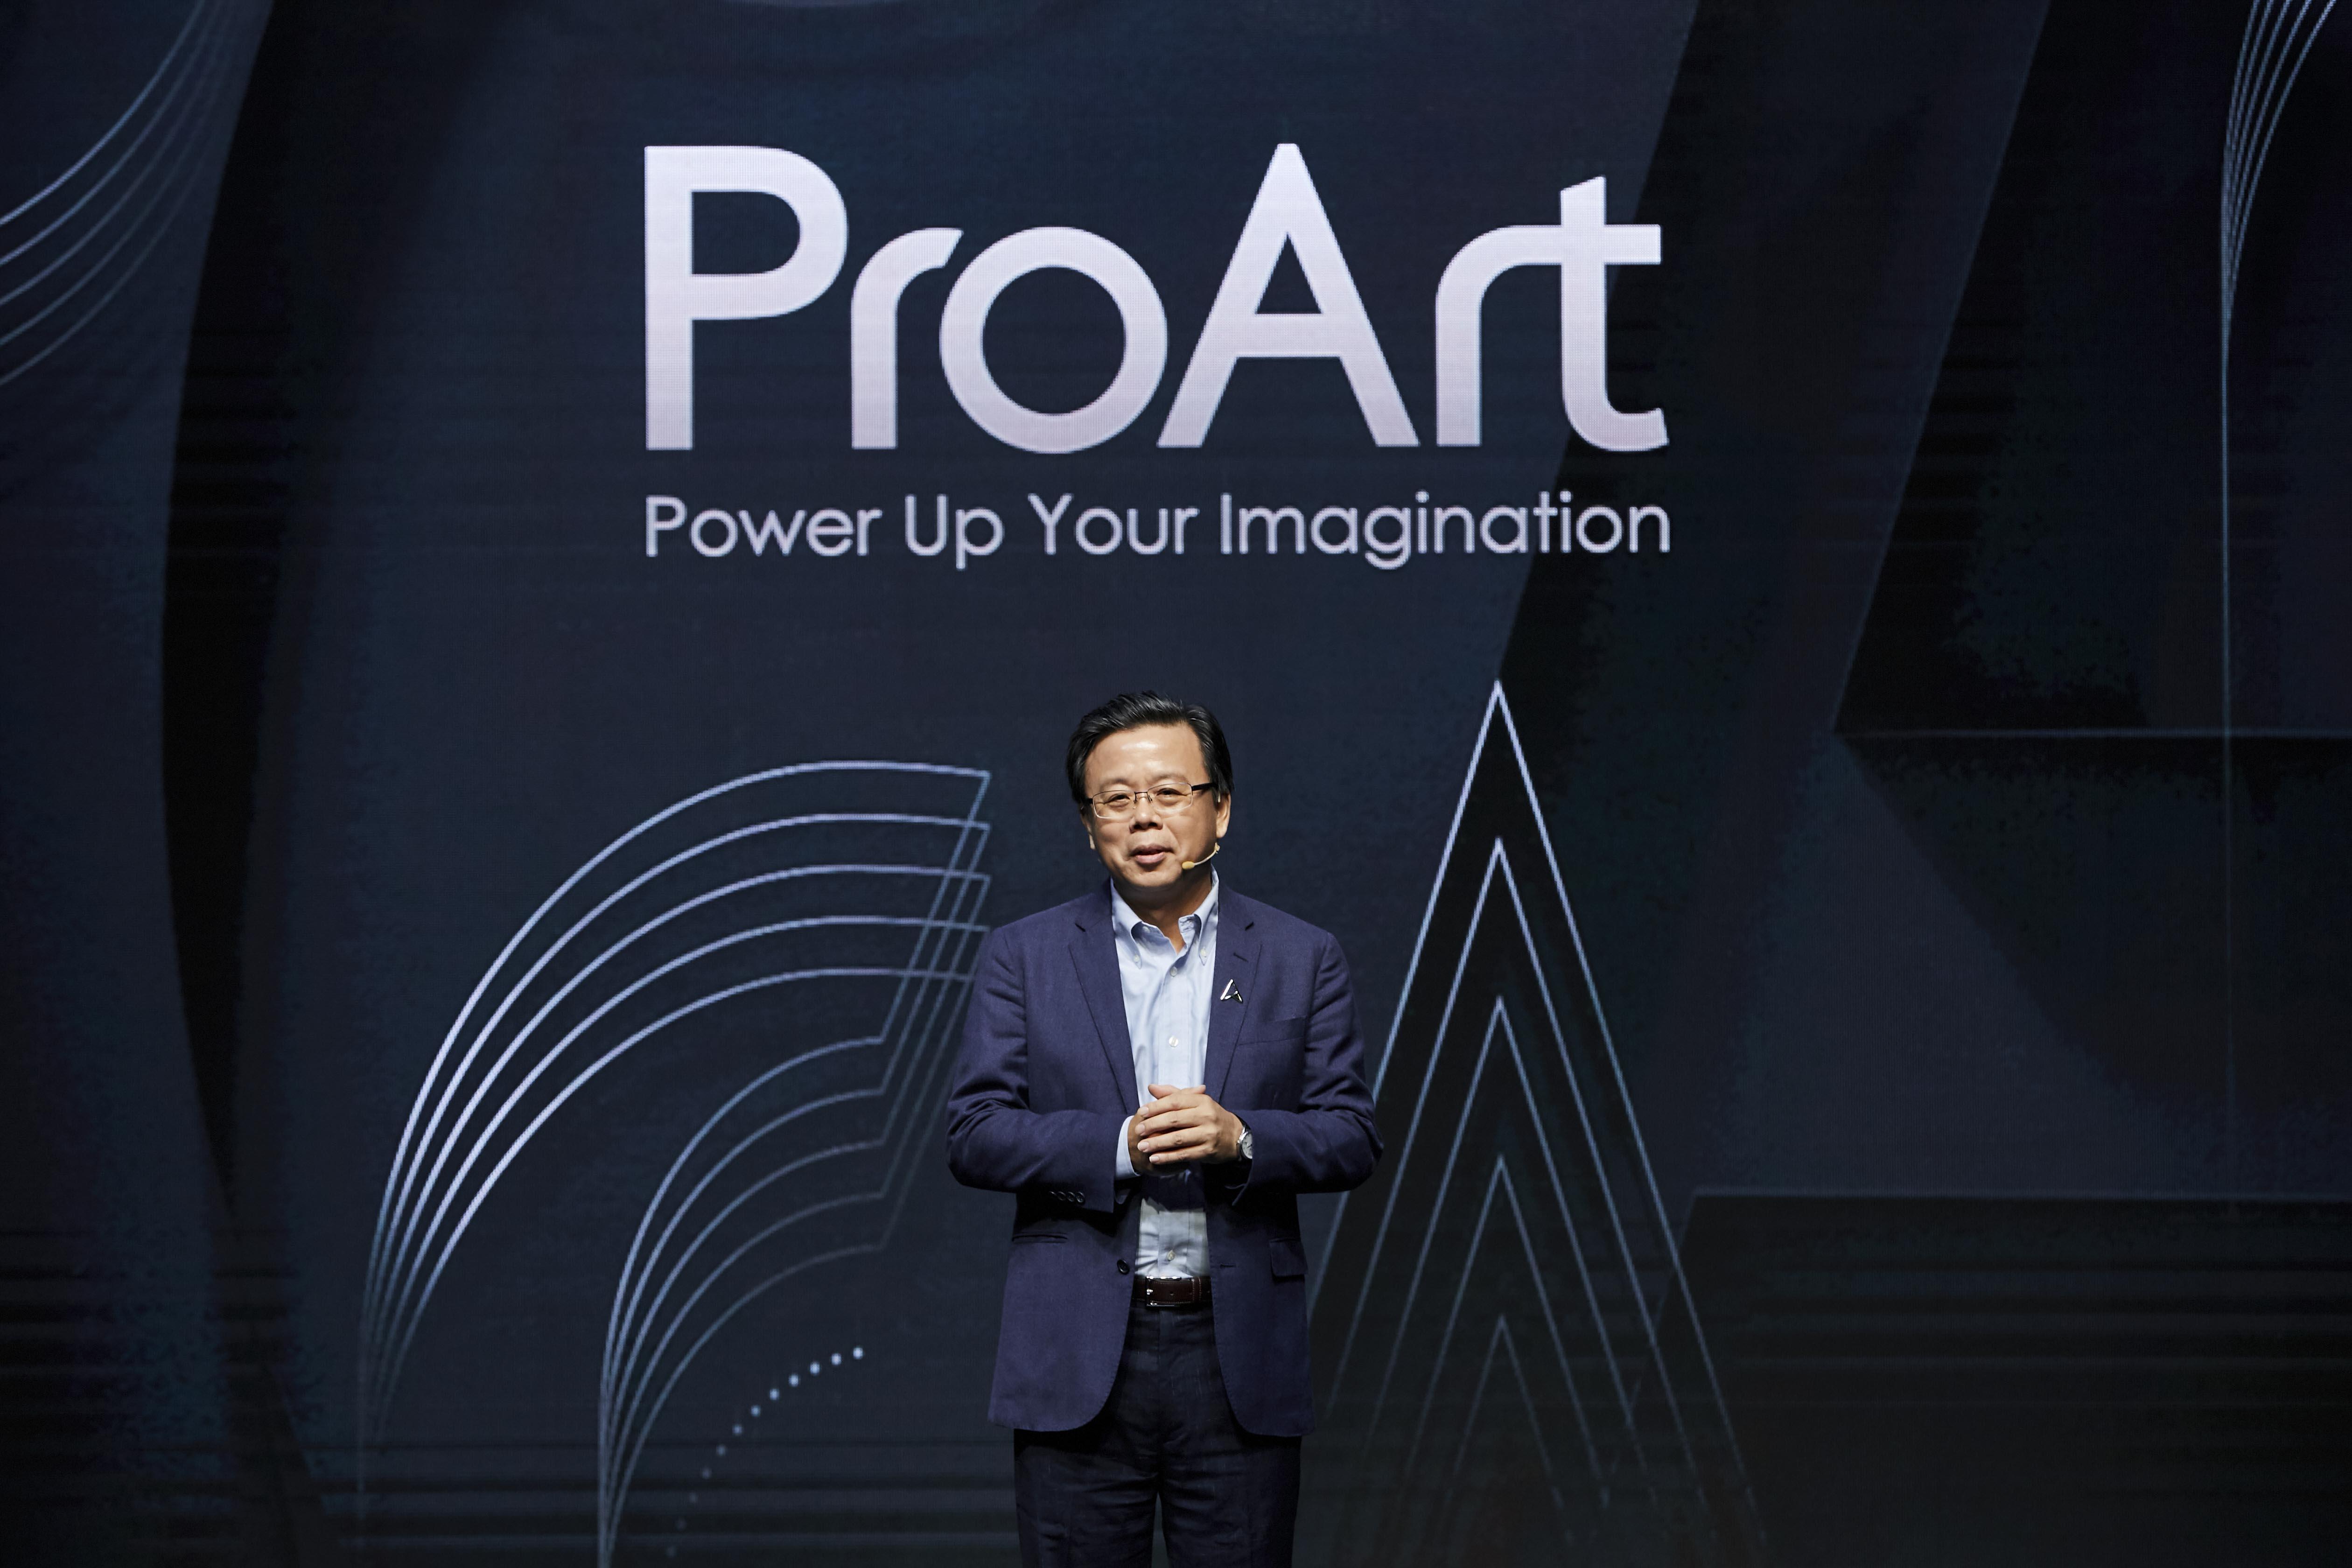 ProArt創作者系列產品,能讓許多內容創作者能夠更專注在創作上,為夢想賦予更多能量。